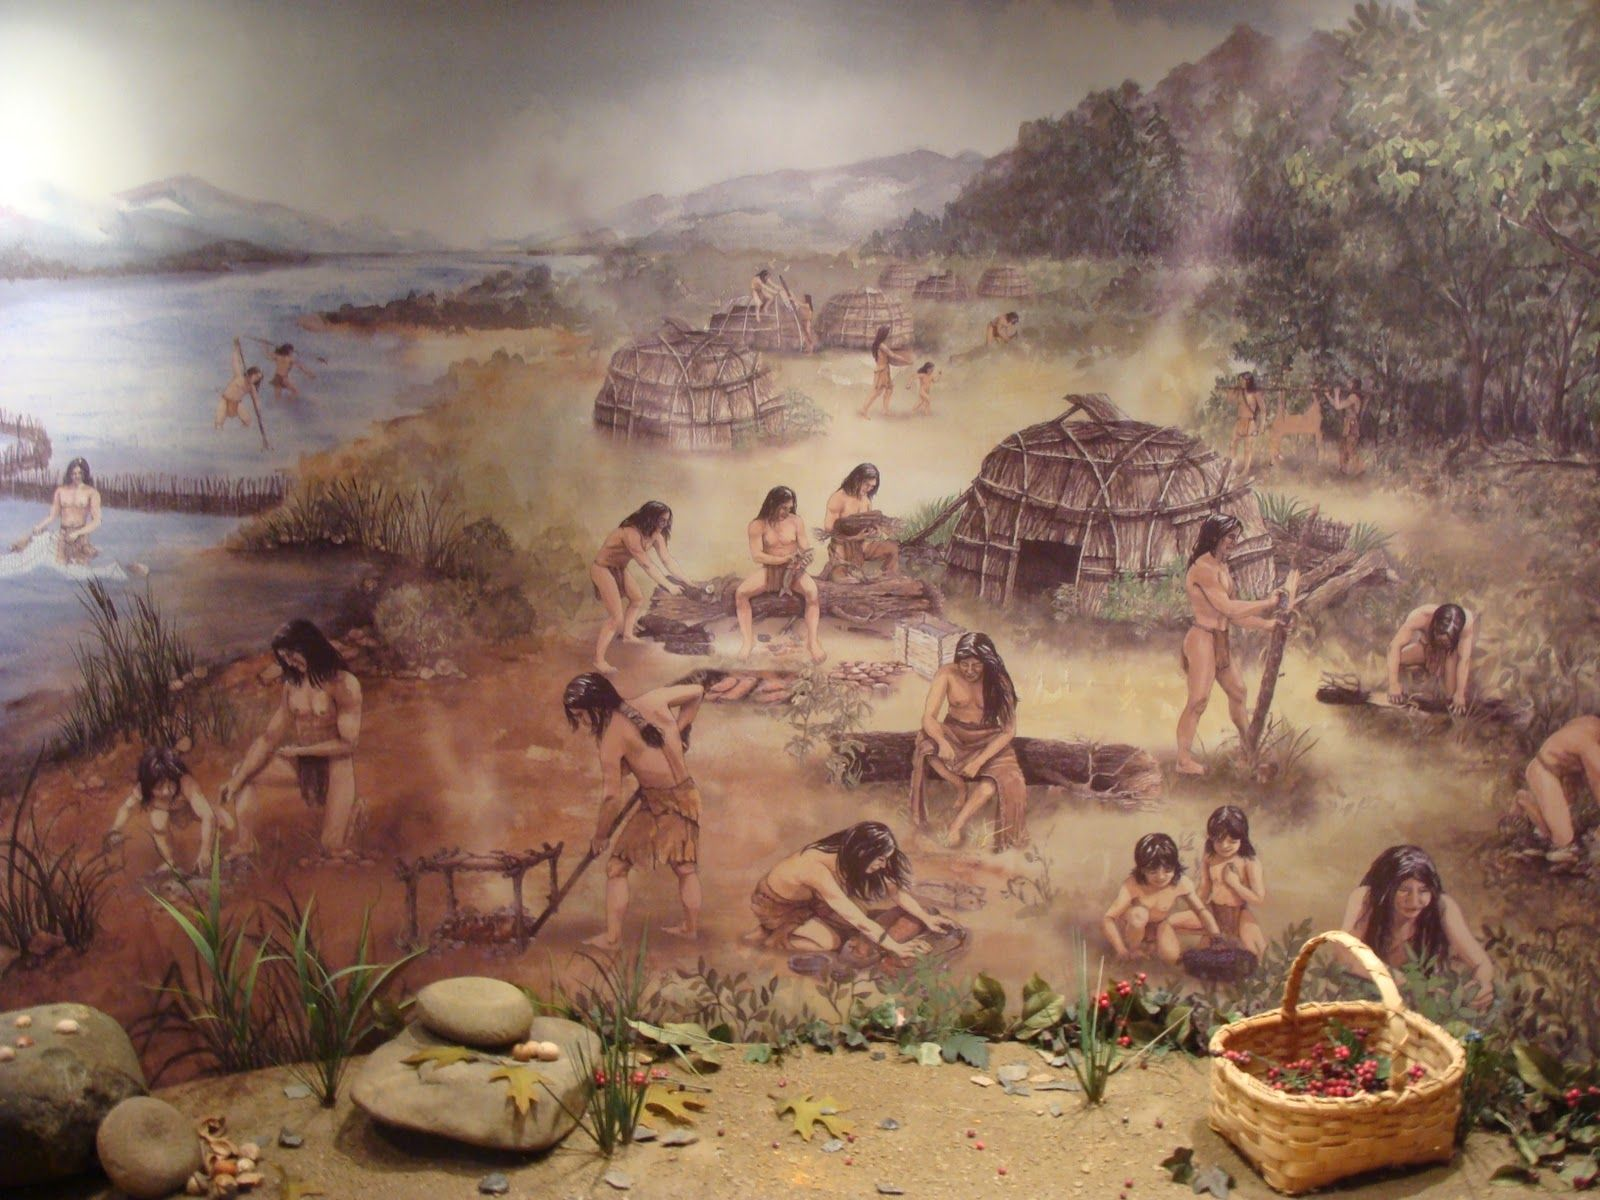 7. The Algonquin Indian Trip